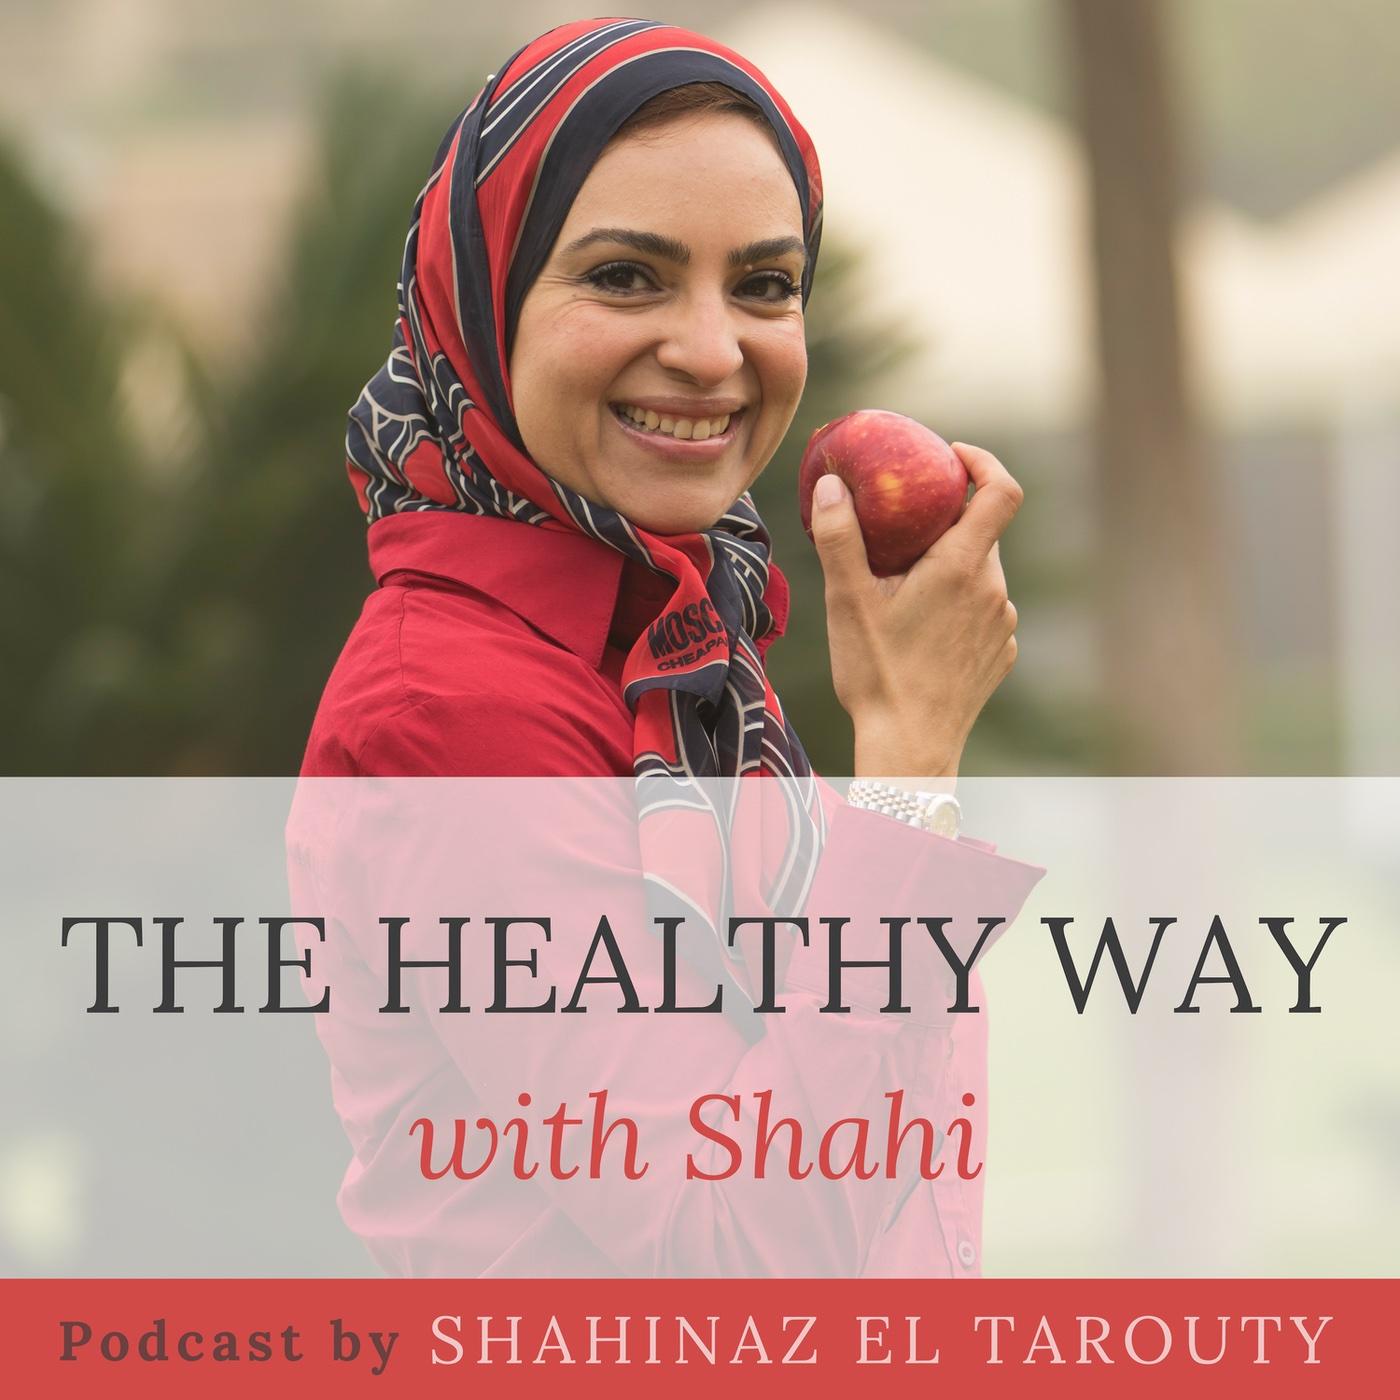 The Healthy Way with Shahi show art